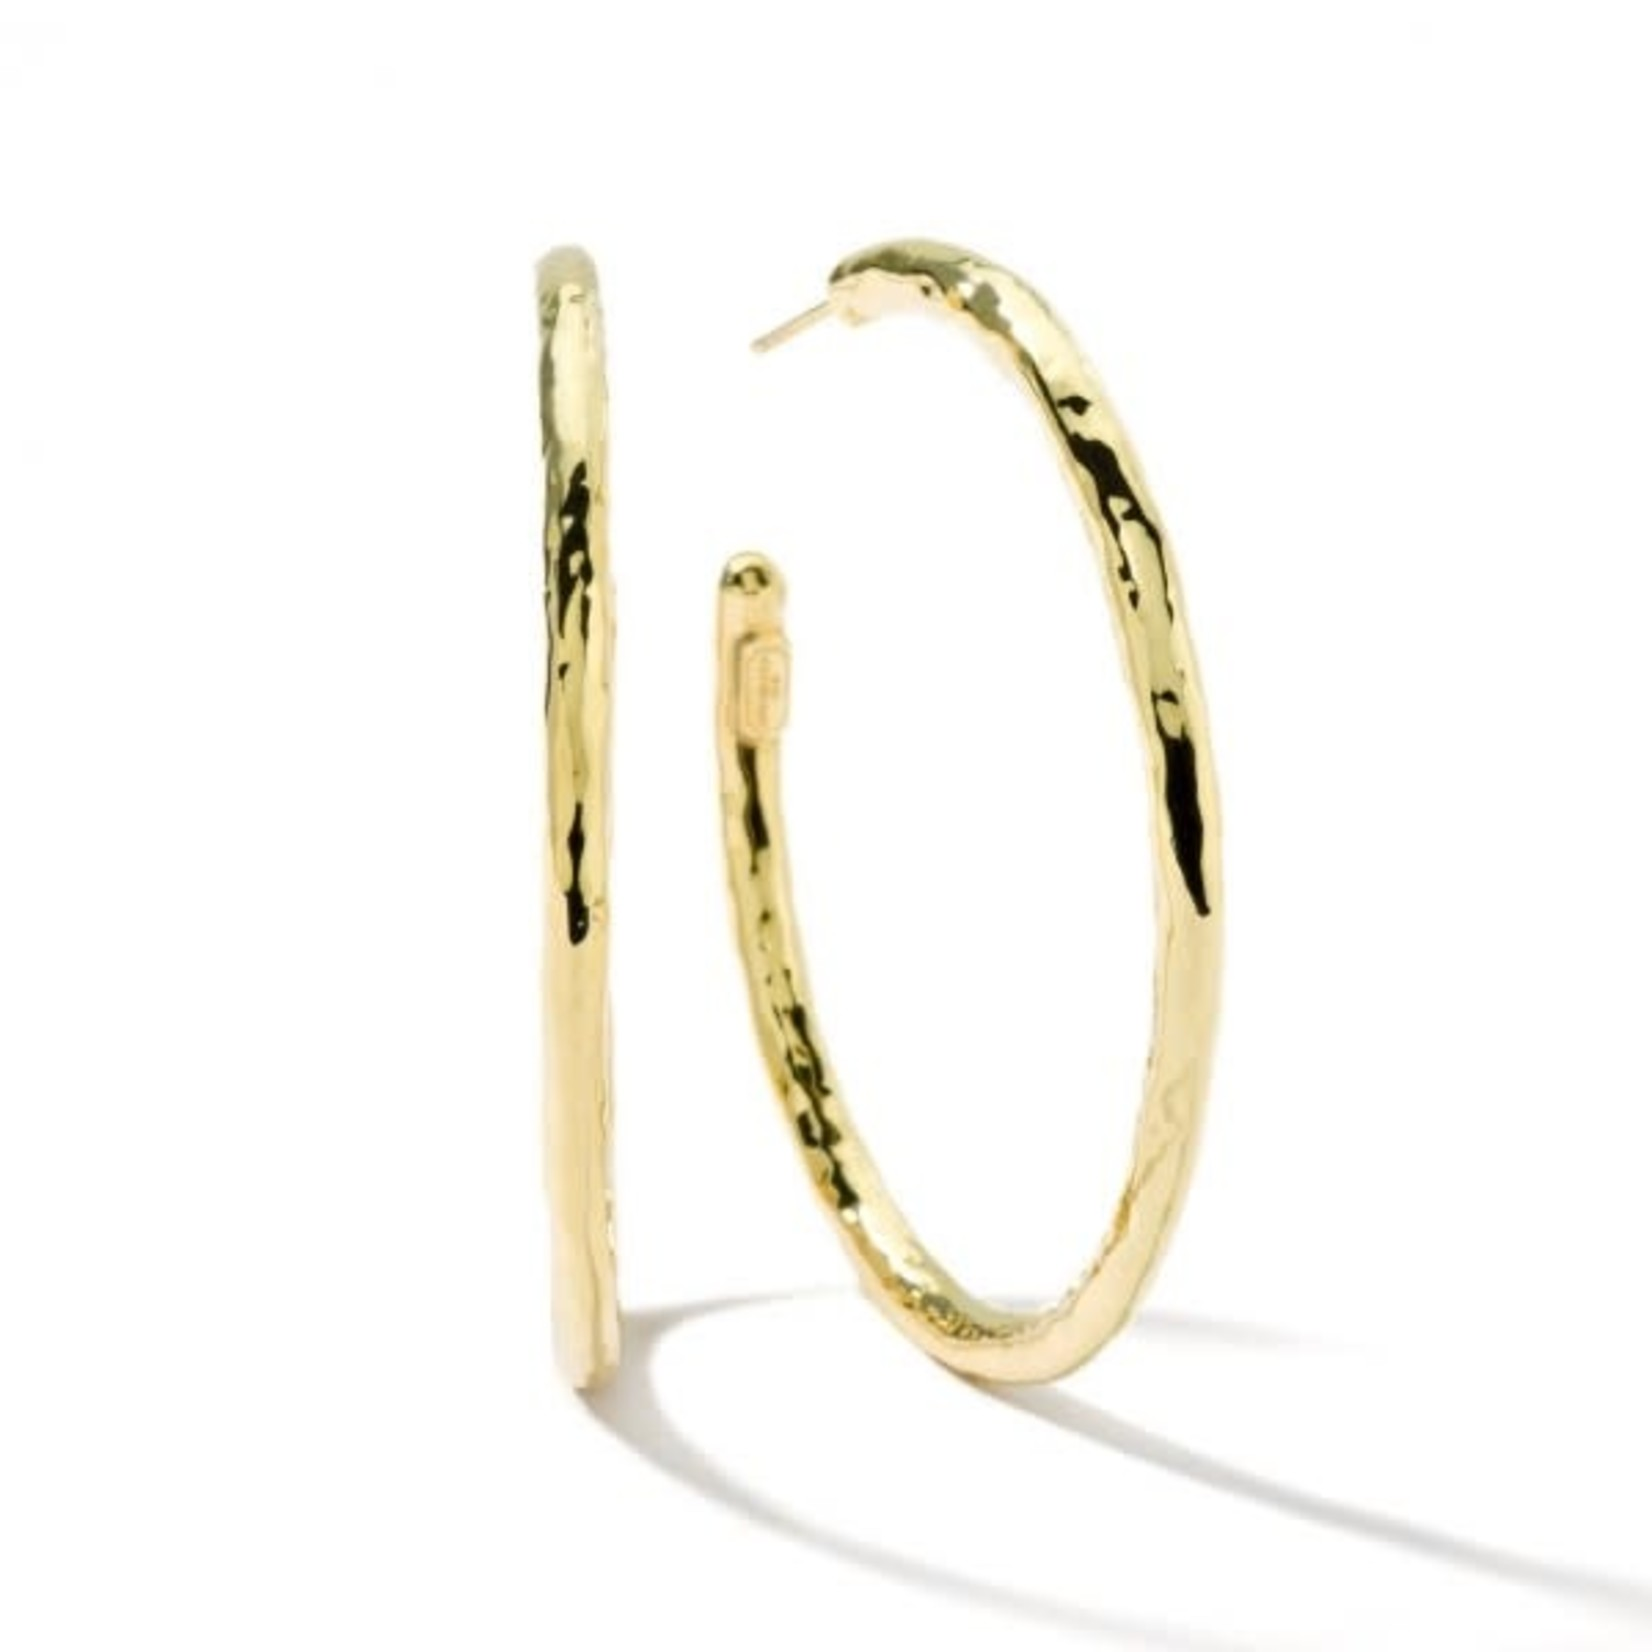 18K Gold Large Hammered Hoop Earrings by IPPOLITA